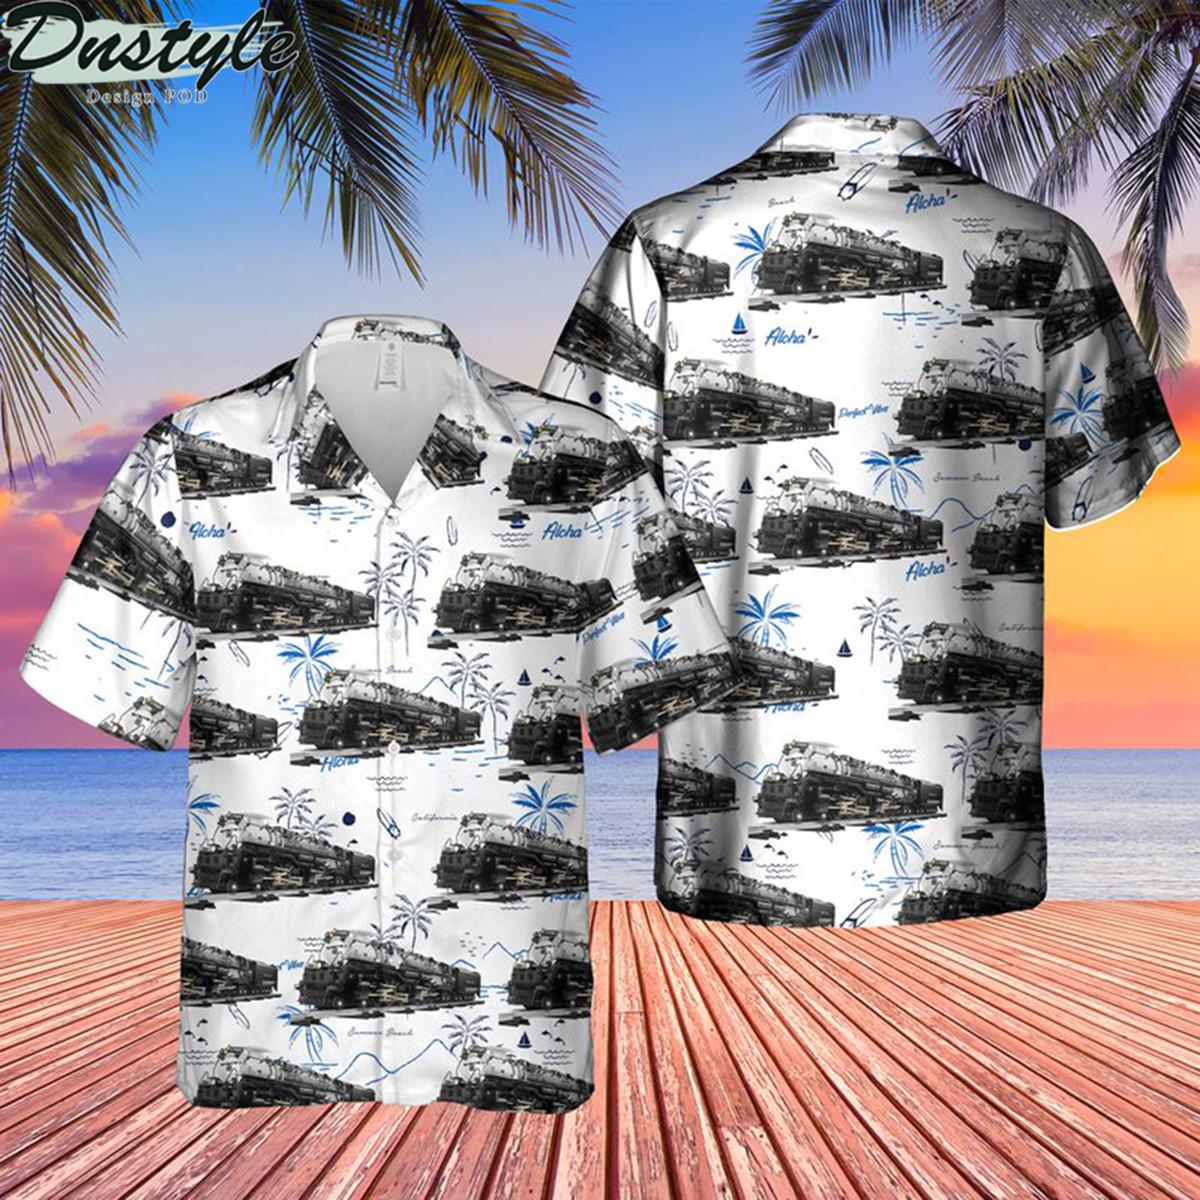 Union pacific challenger no 3985 hawaiian shirt 2